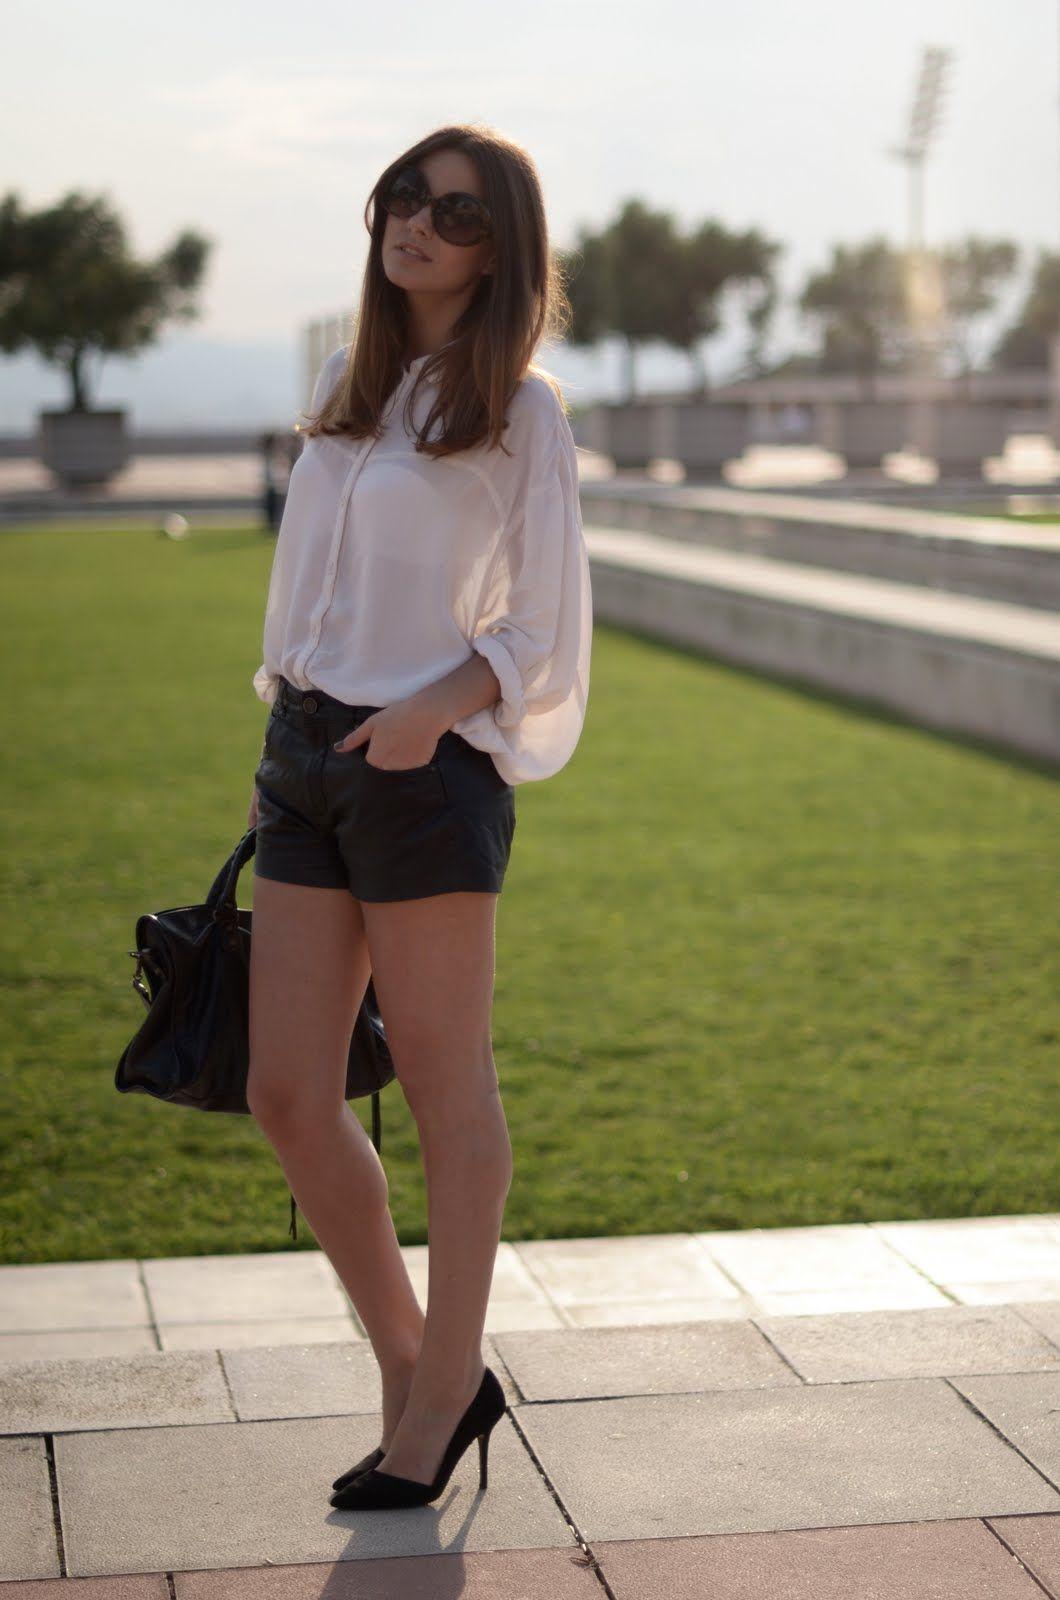 FASHIONVIBE: Leather Shorts And Heels